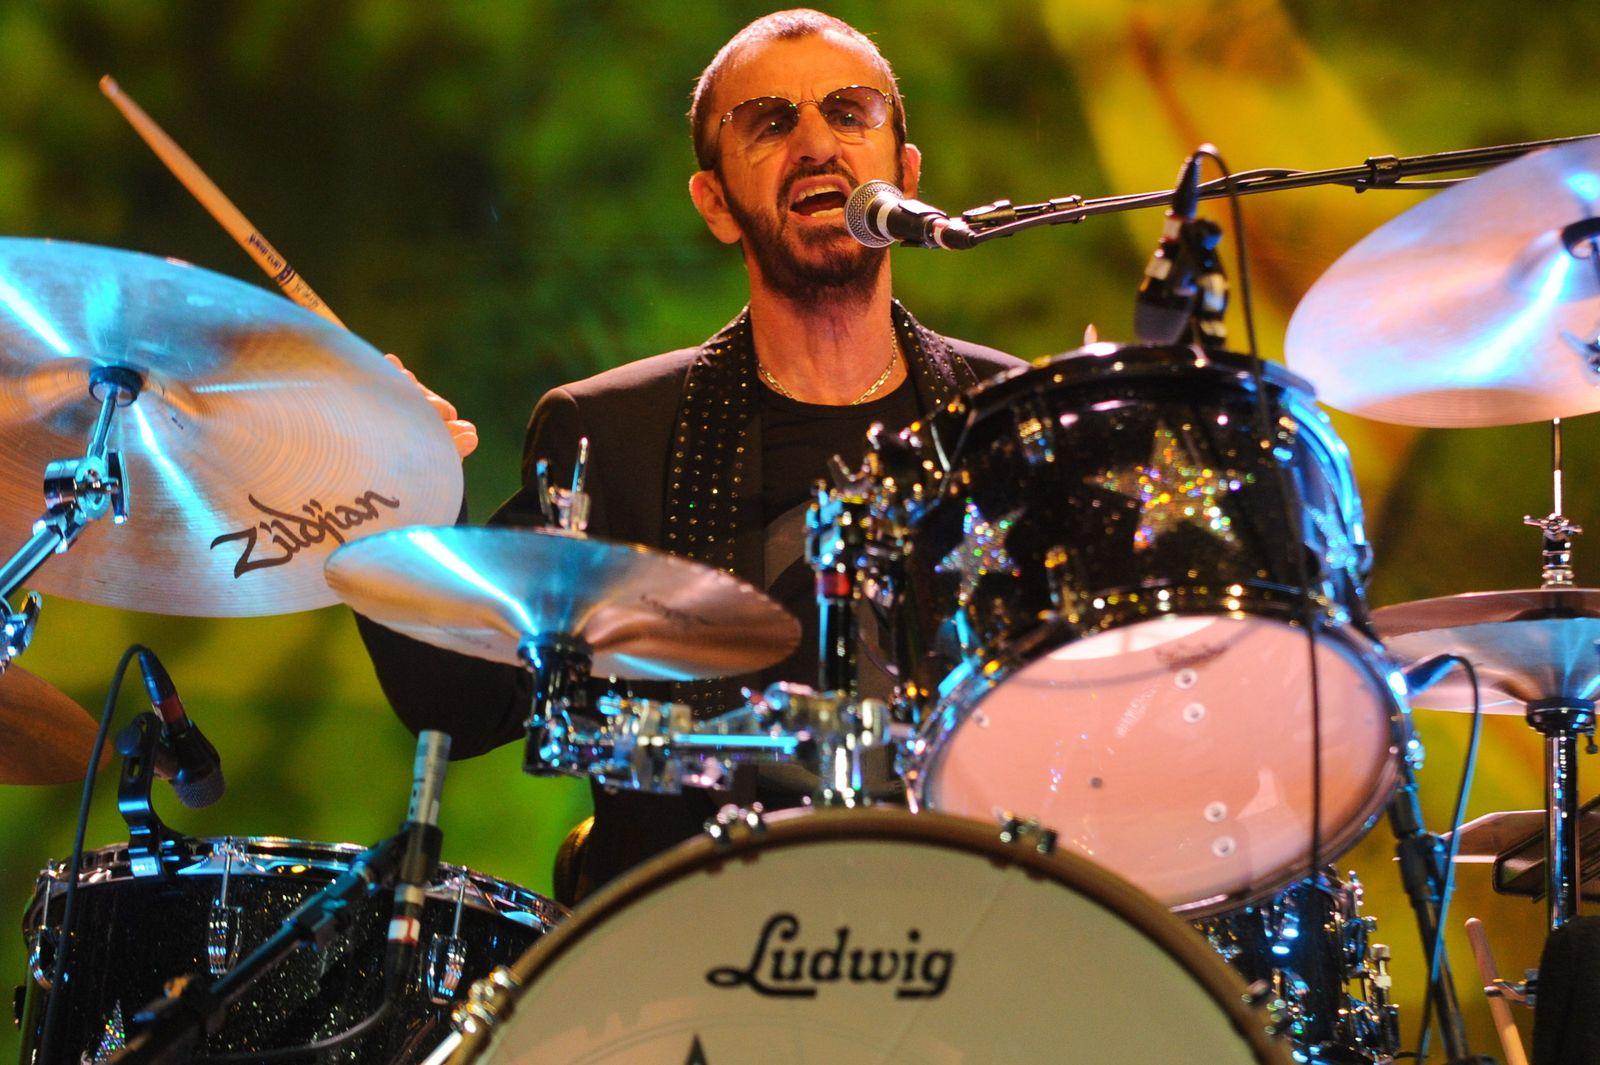 Ex-Beatle Ringo Starr wird 80